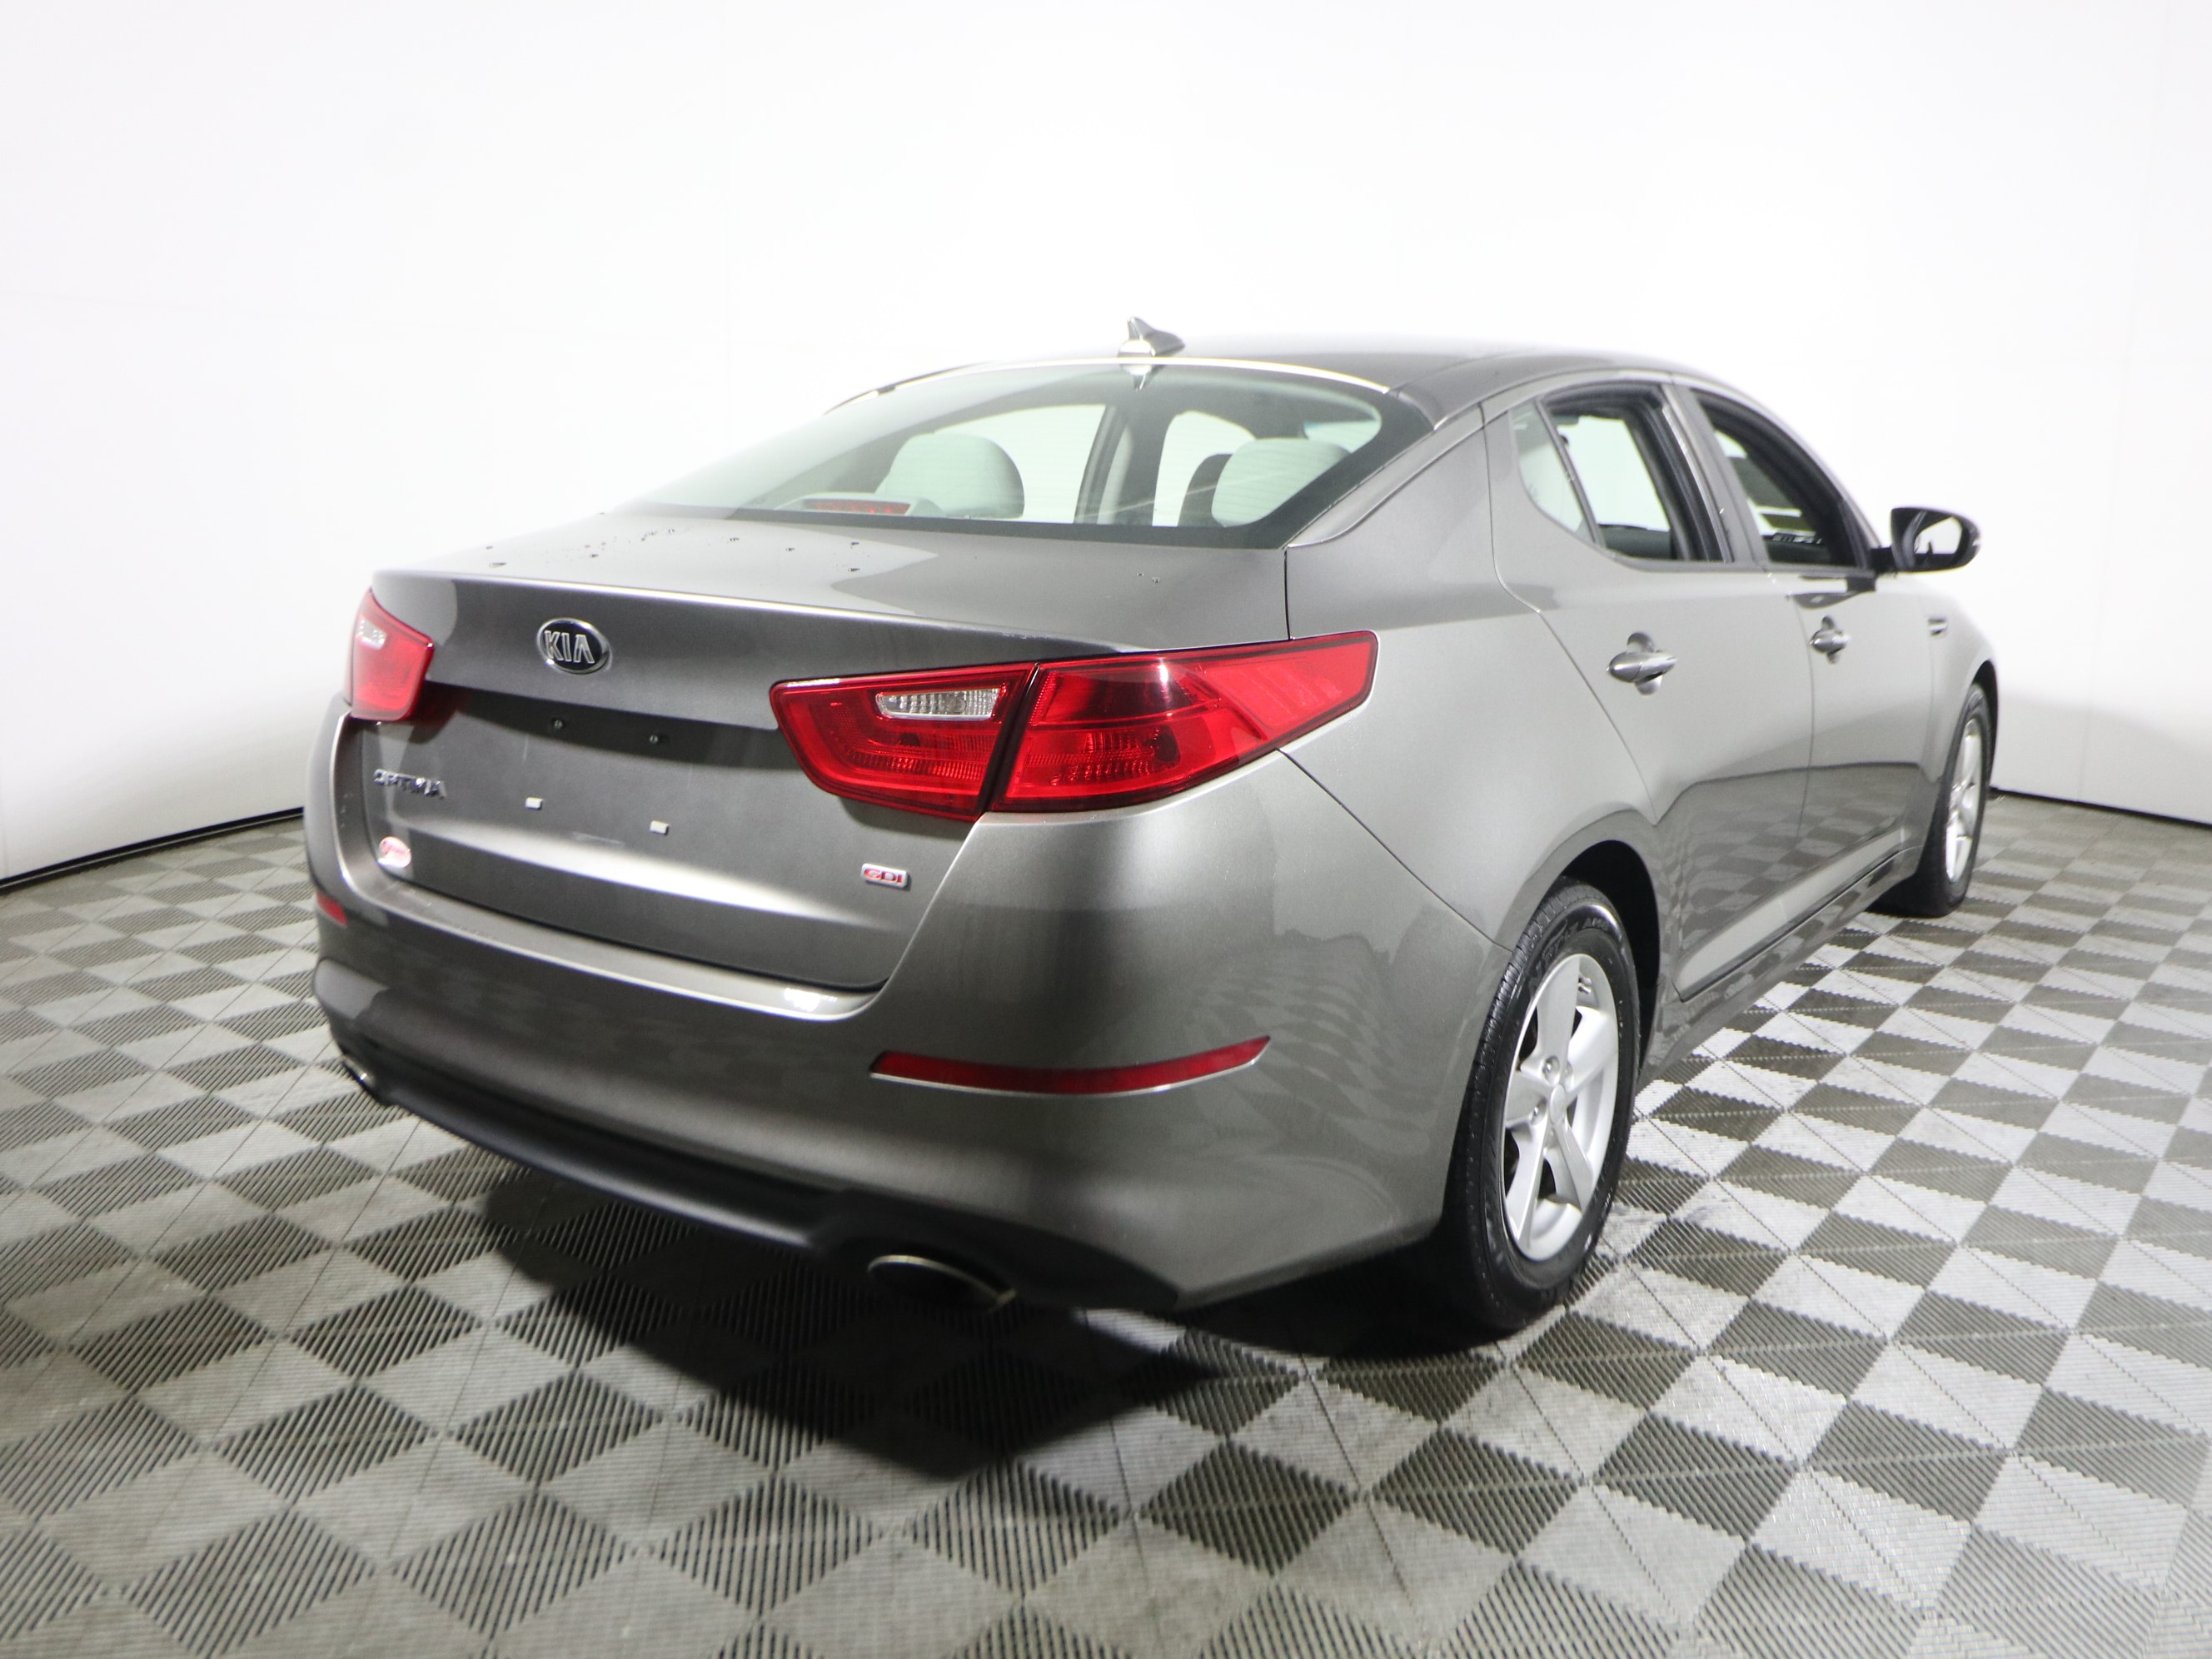 2015 Kia Optima - Fair Car Ownership